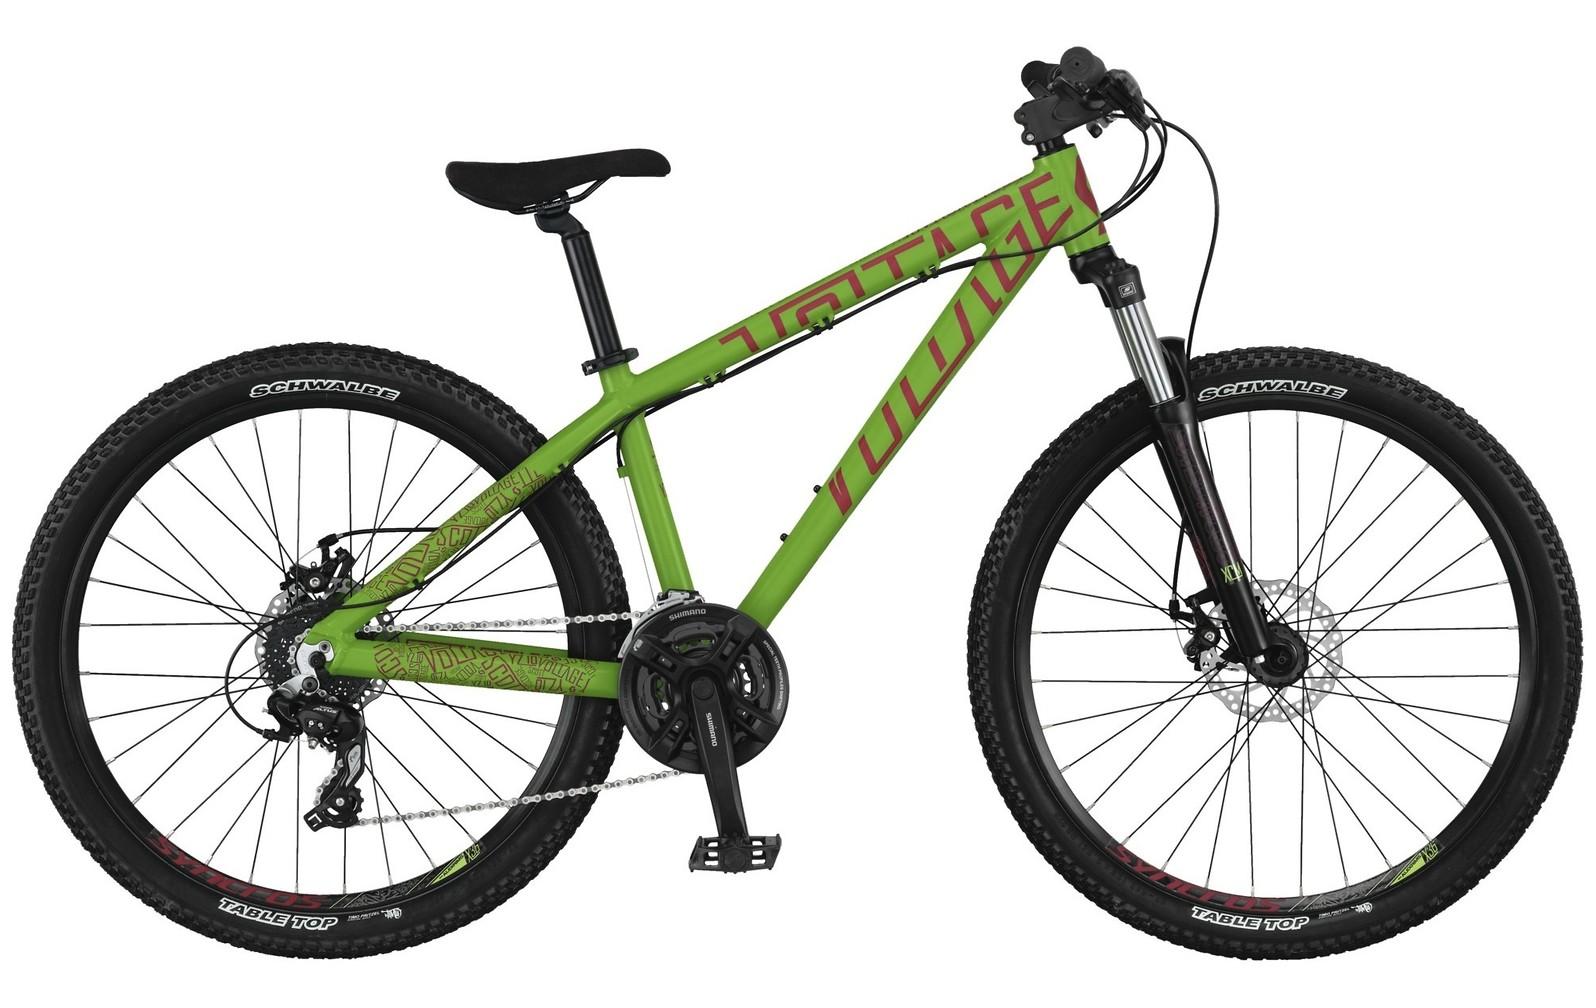 2014 Scott Voltage YZ 30 Bike SCOTT Voltage YZ 30 Bike